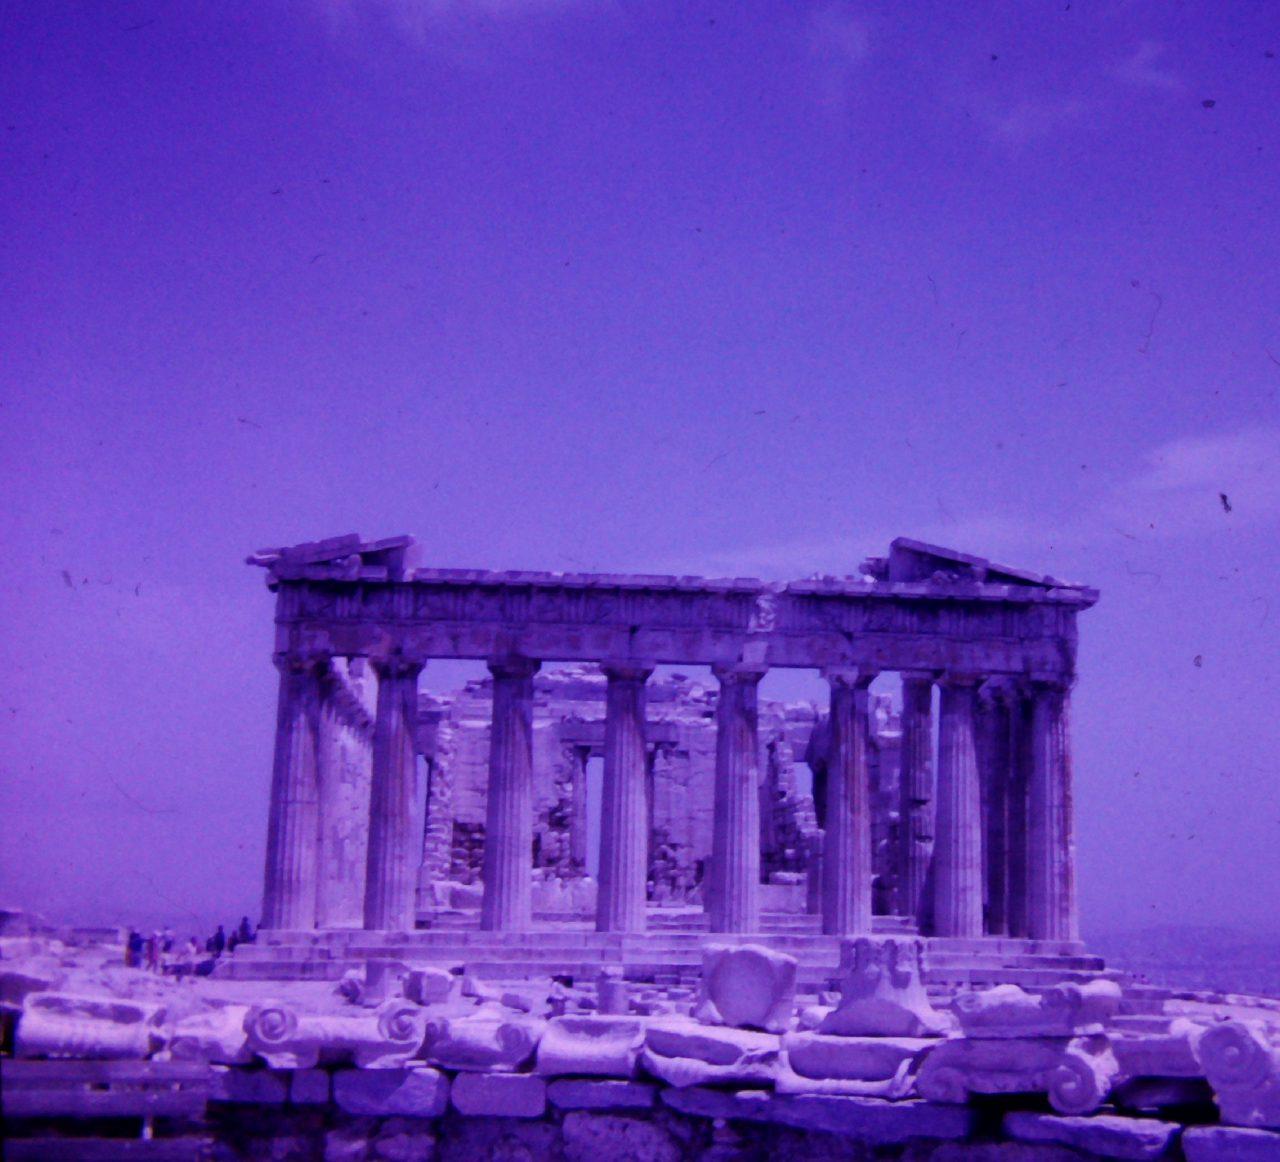 Athen Akropolis, aus Familienbesitz, kasaan media, 2019